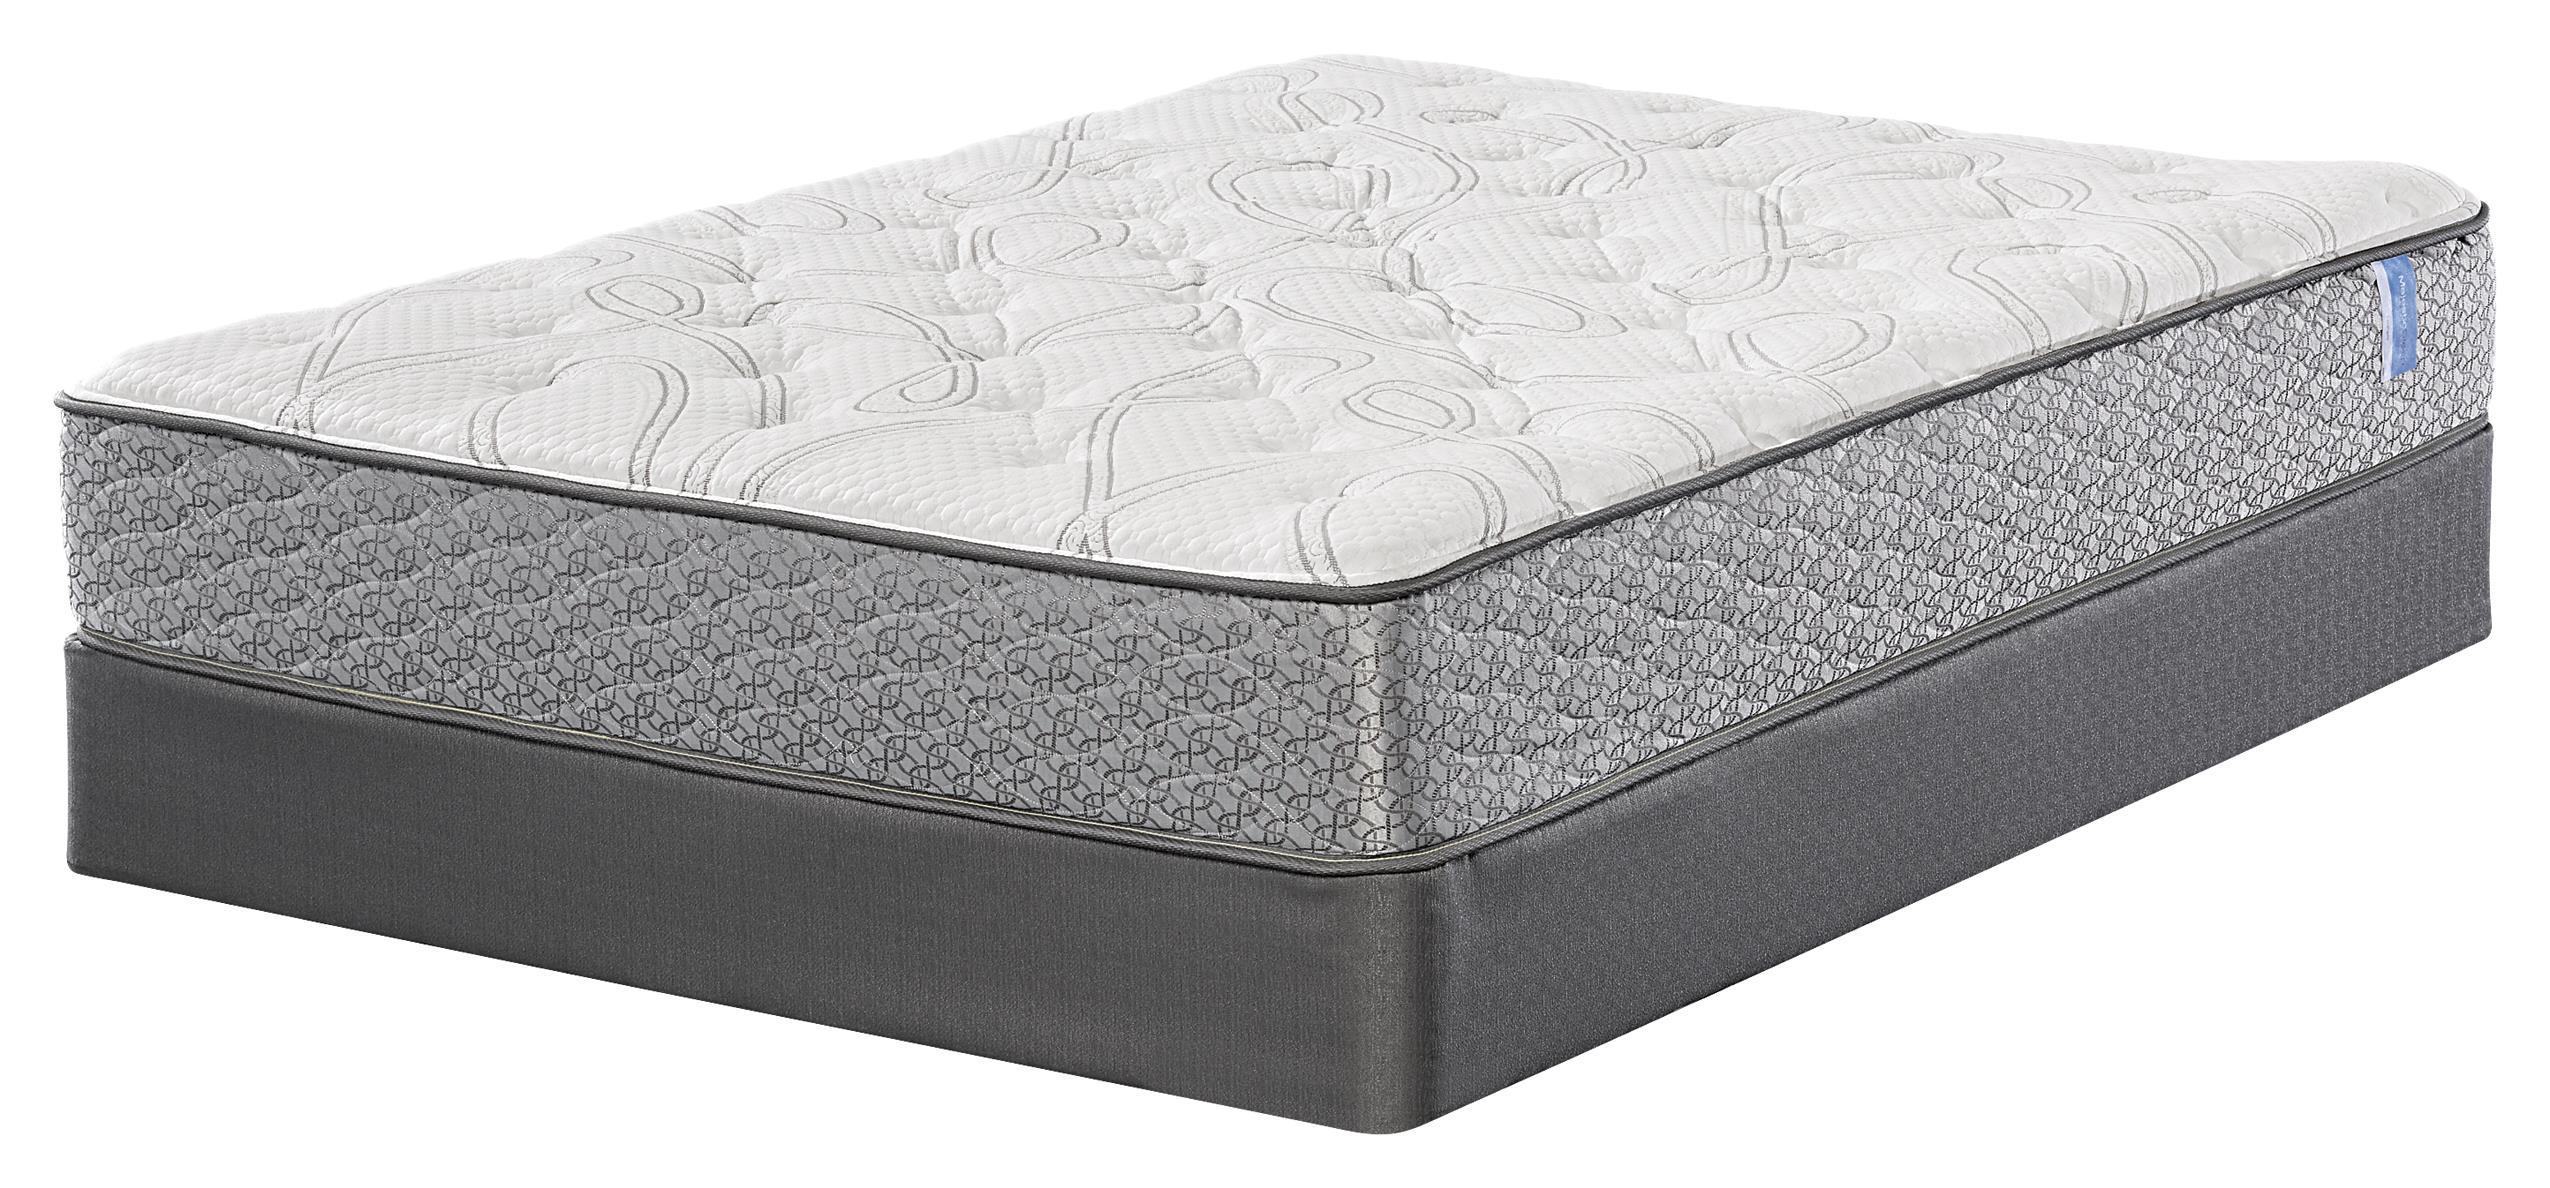 Serta majestic sleep ludlam twin extra long plush mattress for How long does a spring mattress last